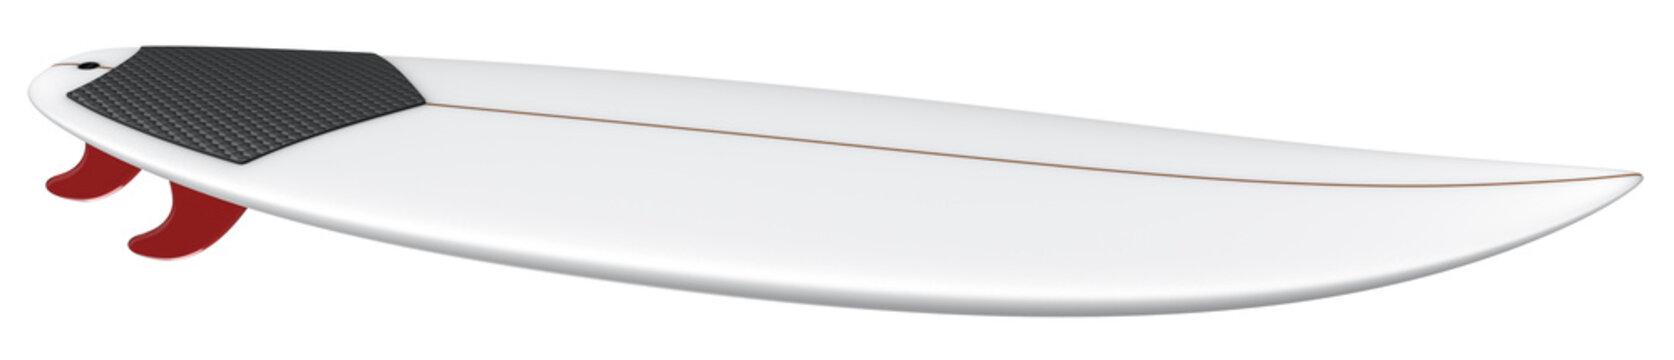 Shortboard blank short surfboard